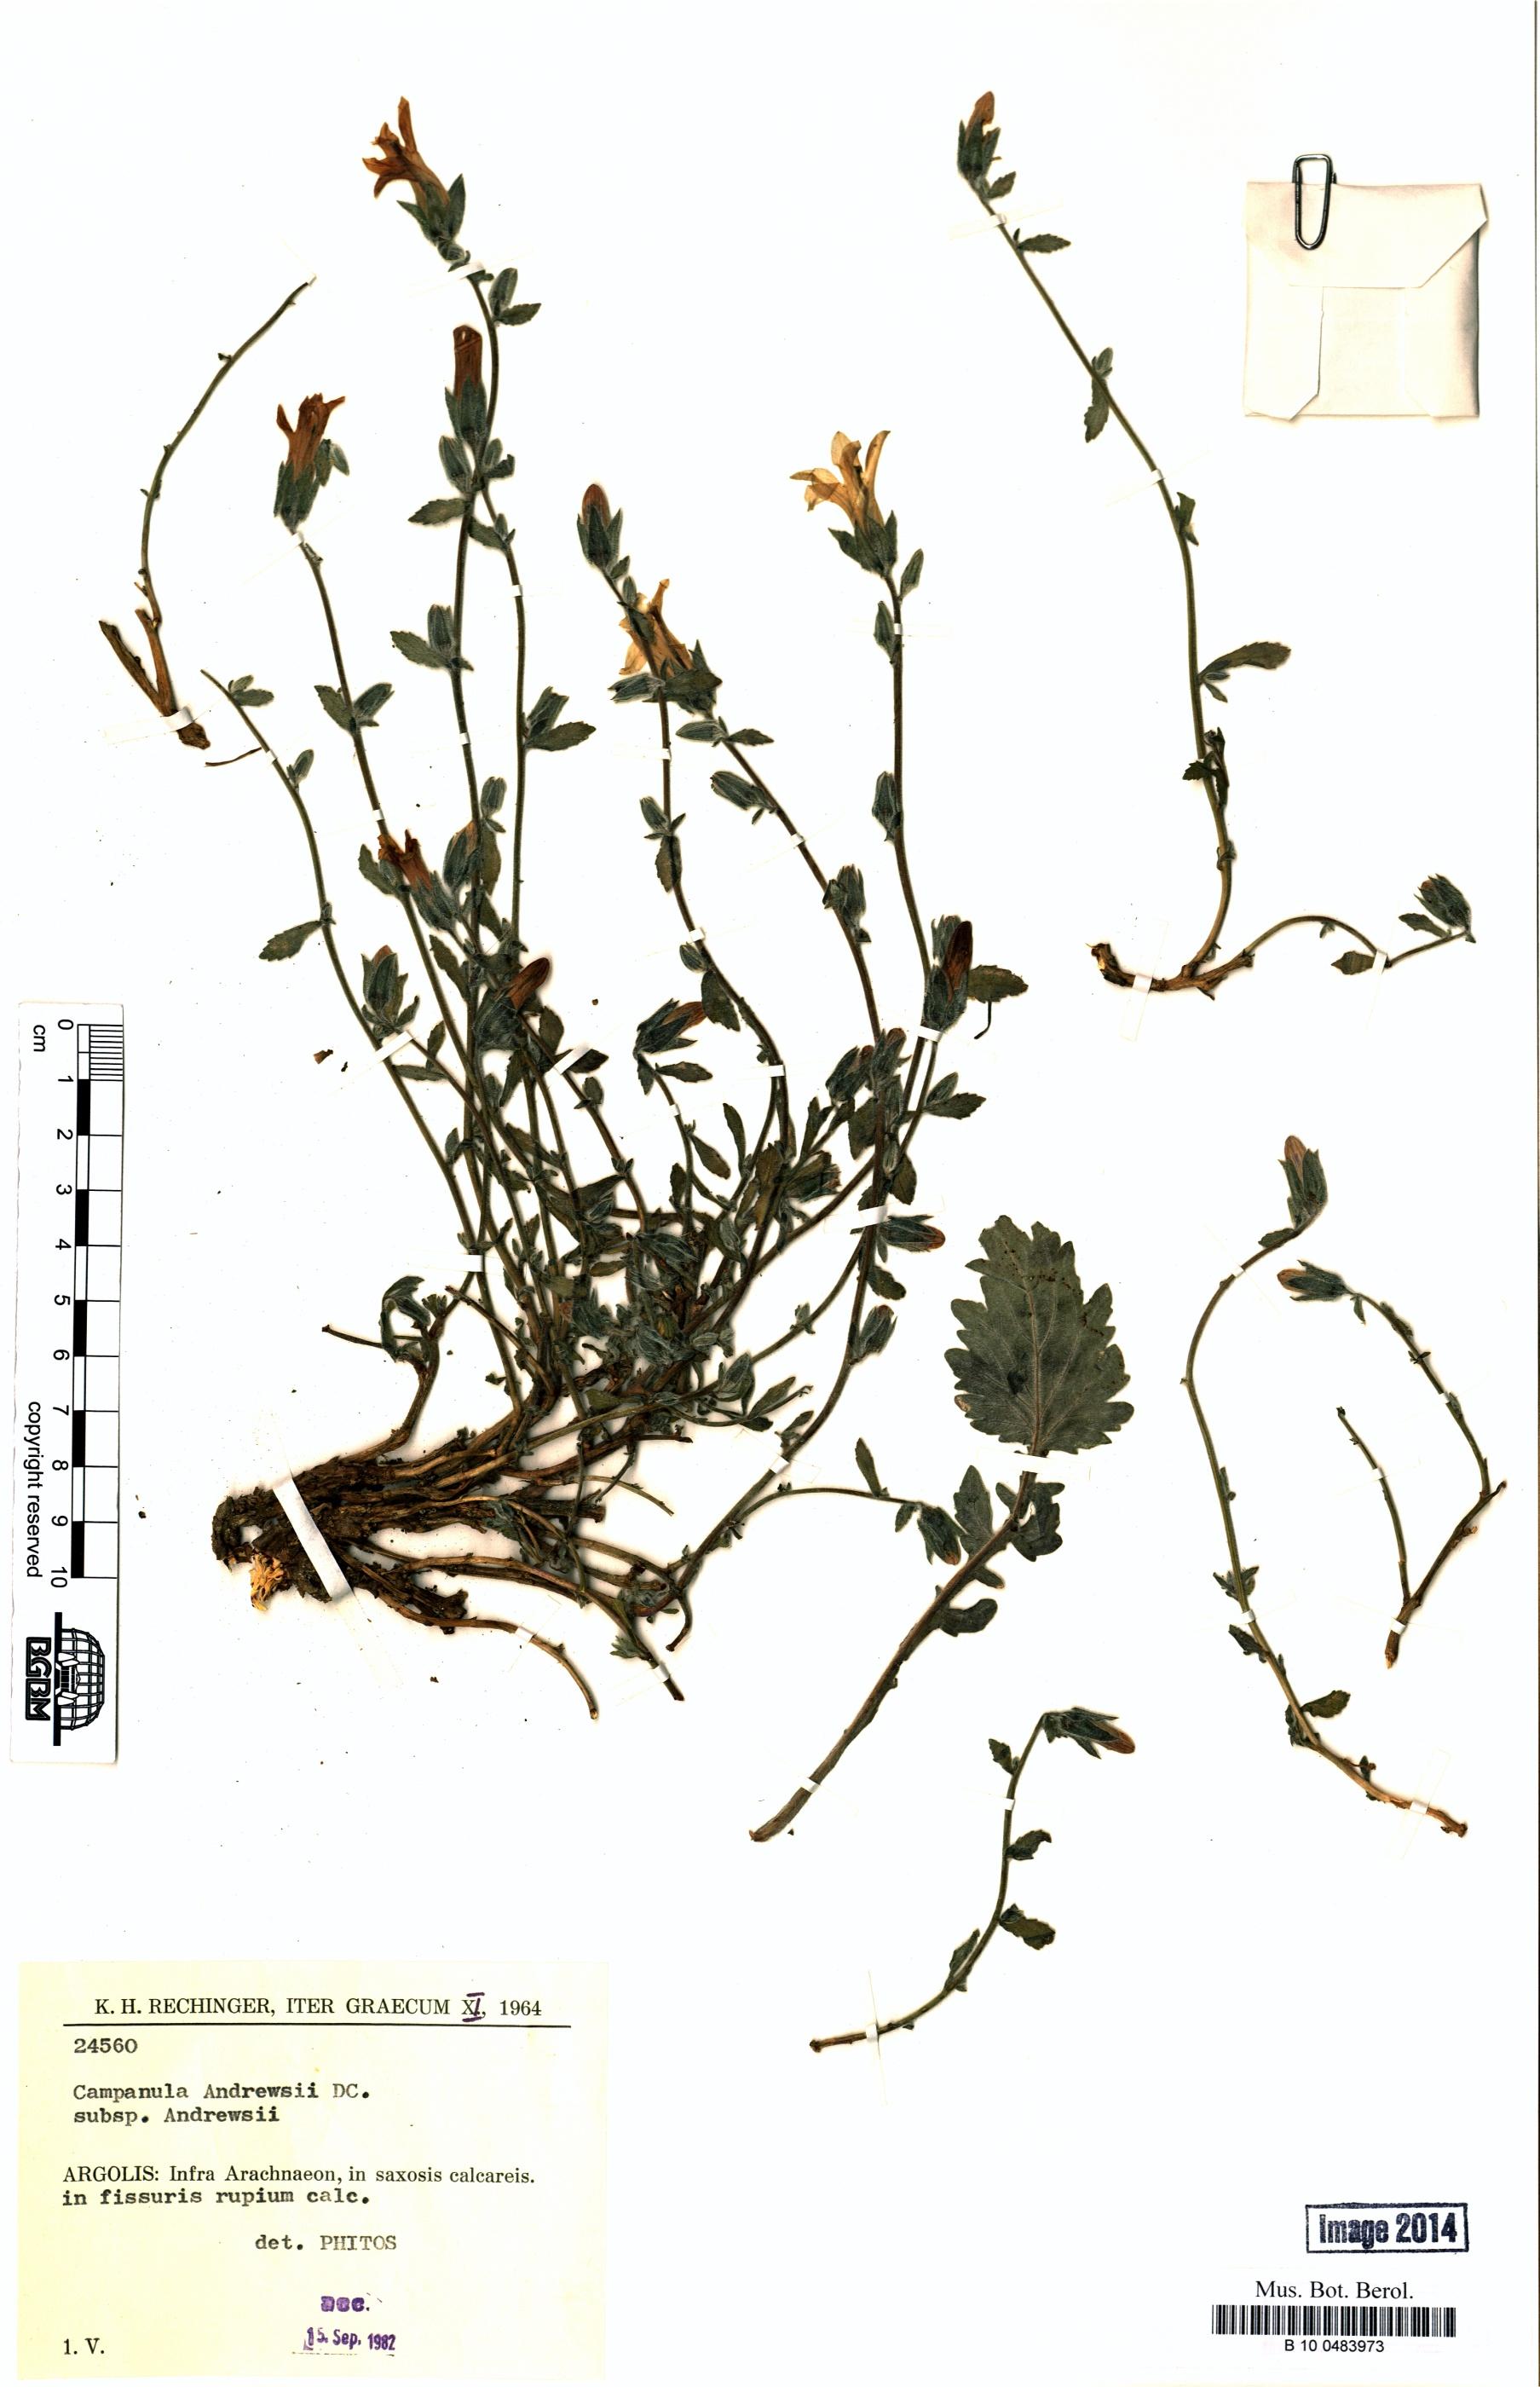 http://ww2.bgbm.org/herbarium/images/B/10/04/83/97/B_10_0483973.jpg